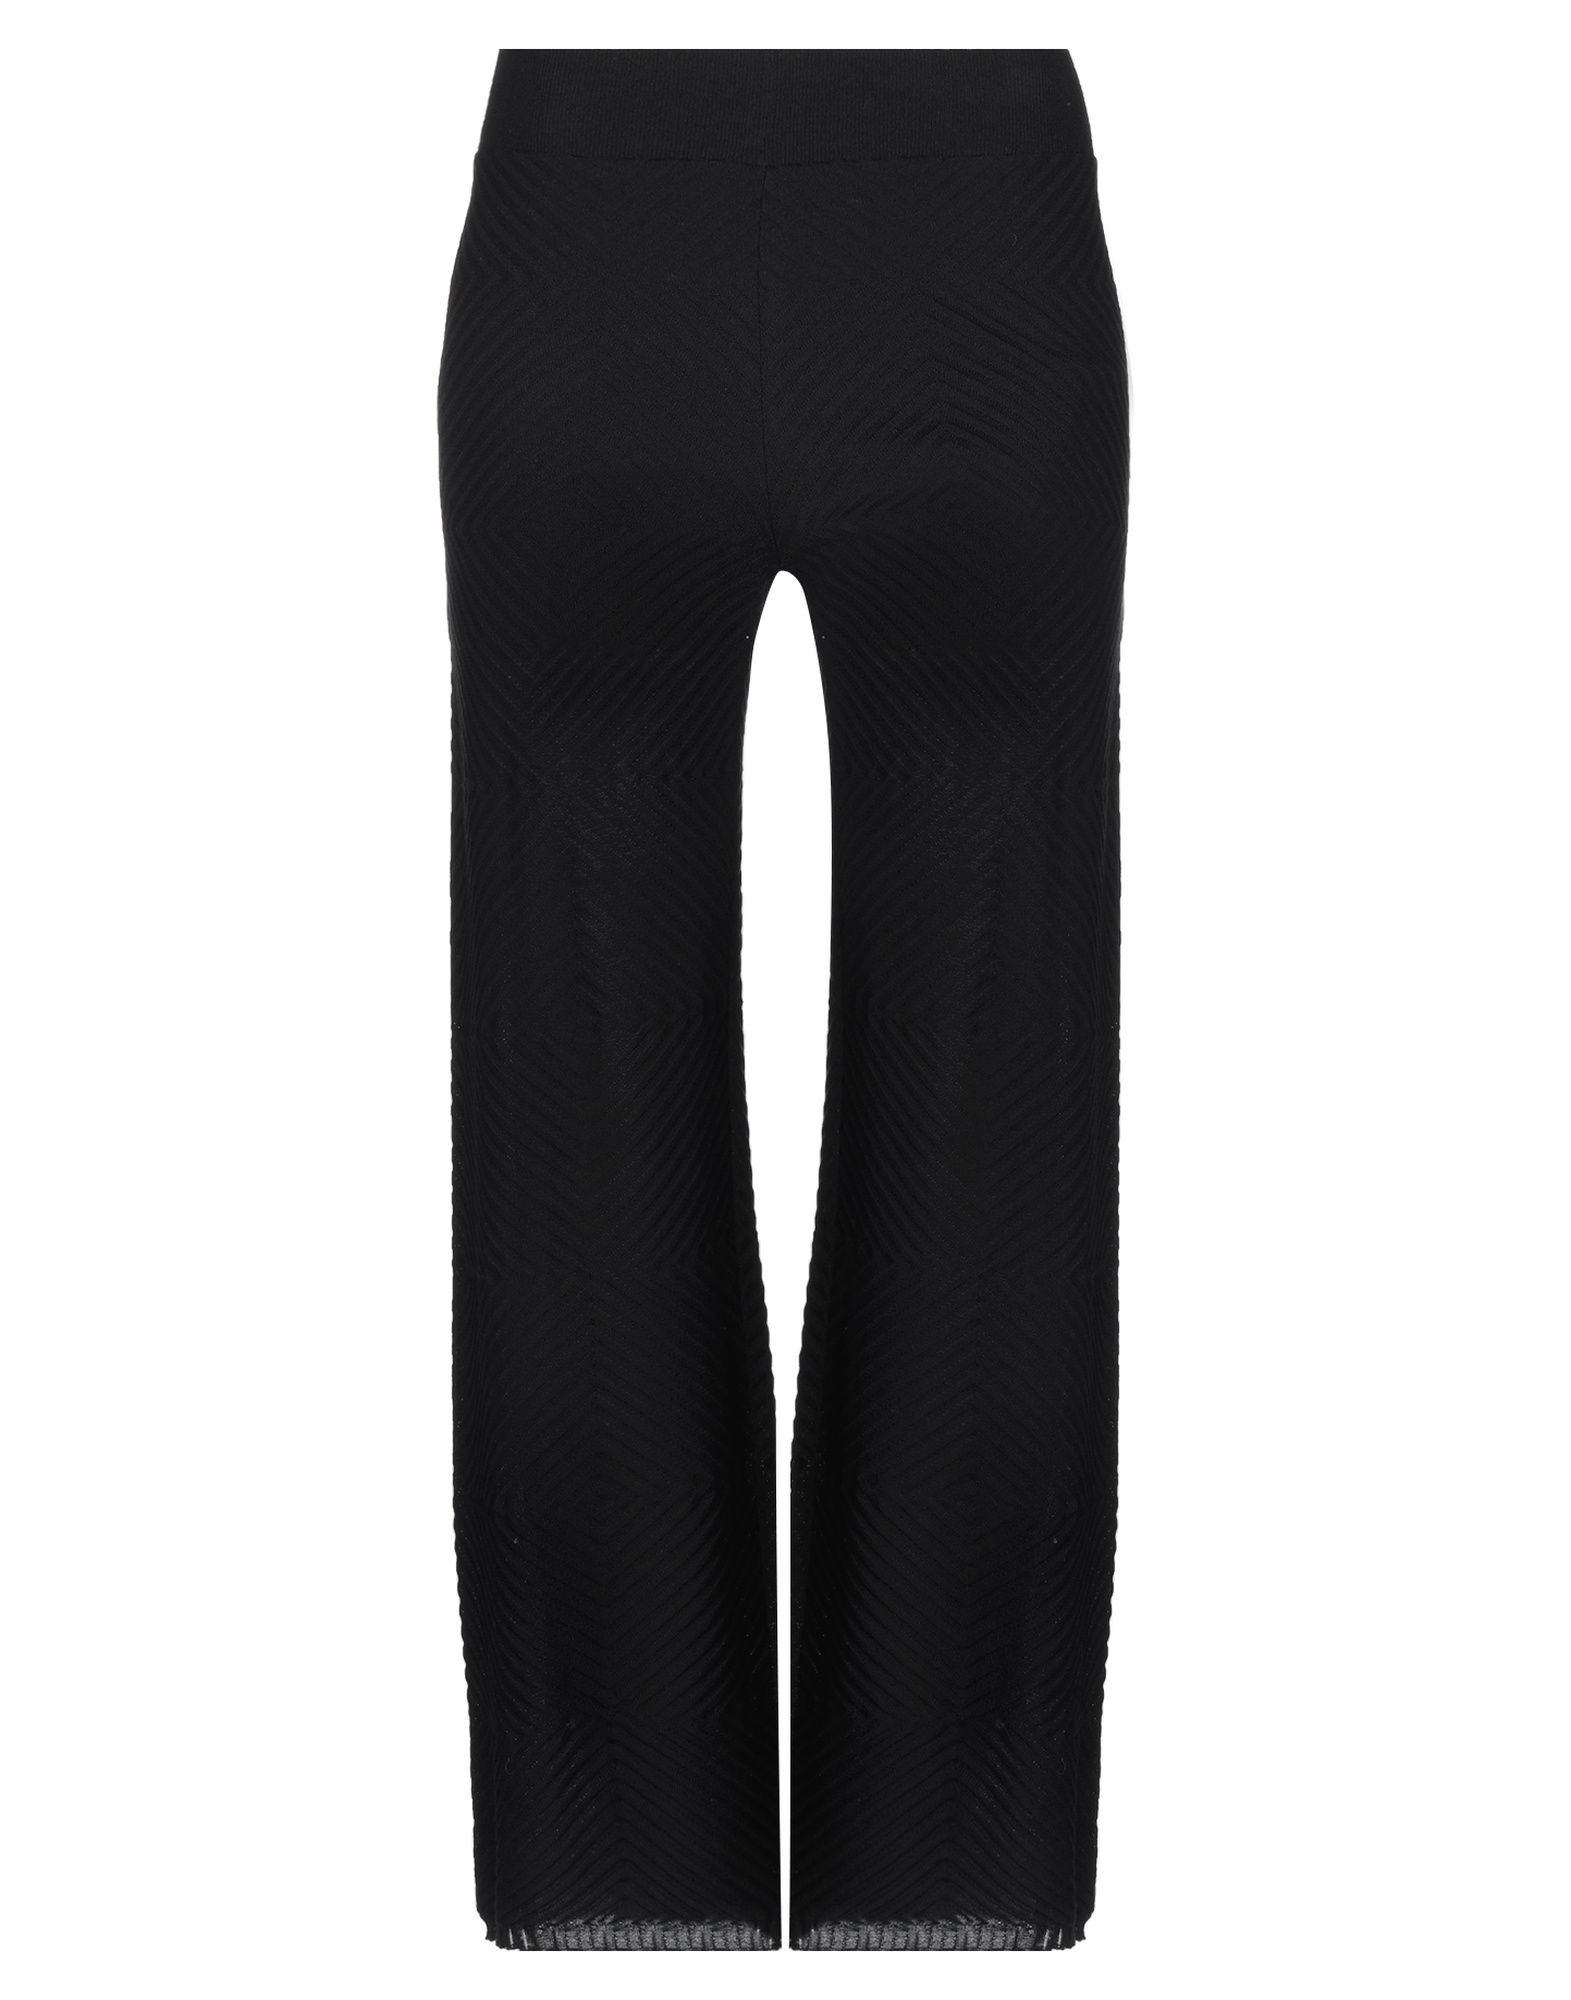 все цены на TRICOT CHIC Повседневные брюки онлайн